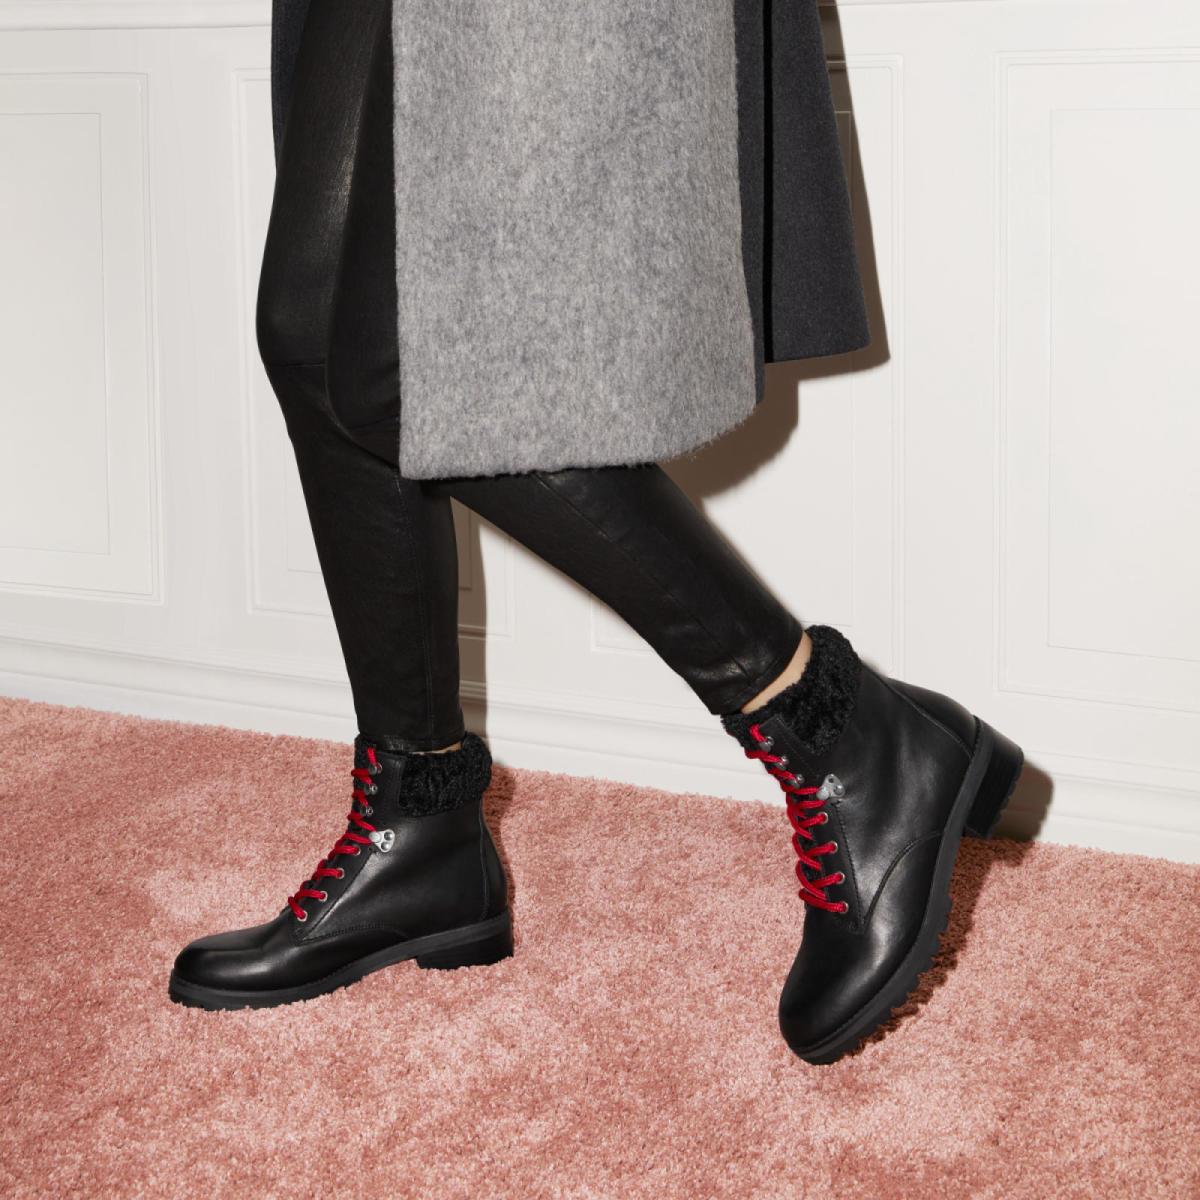 Uleladda Boots, $130, available at Aldo Shoes.